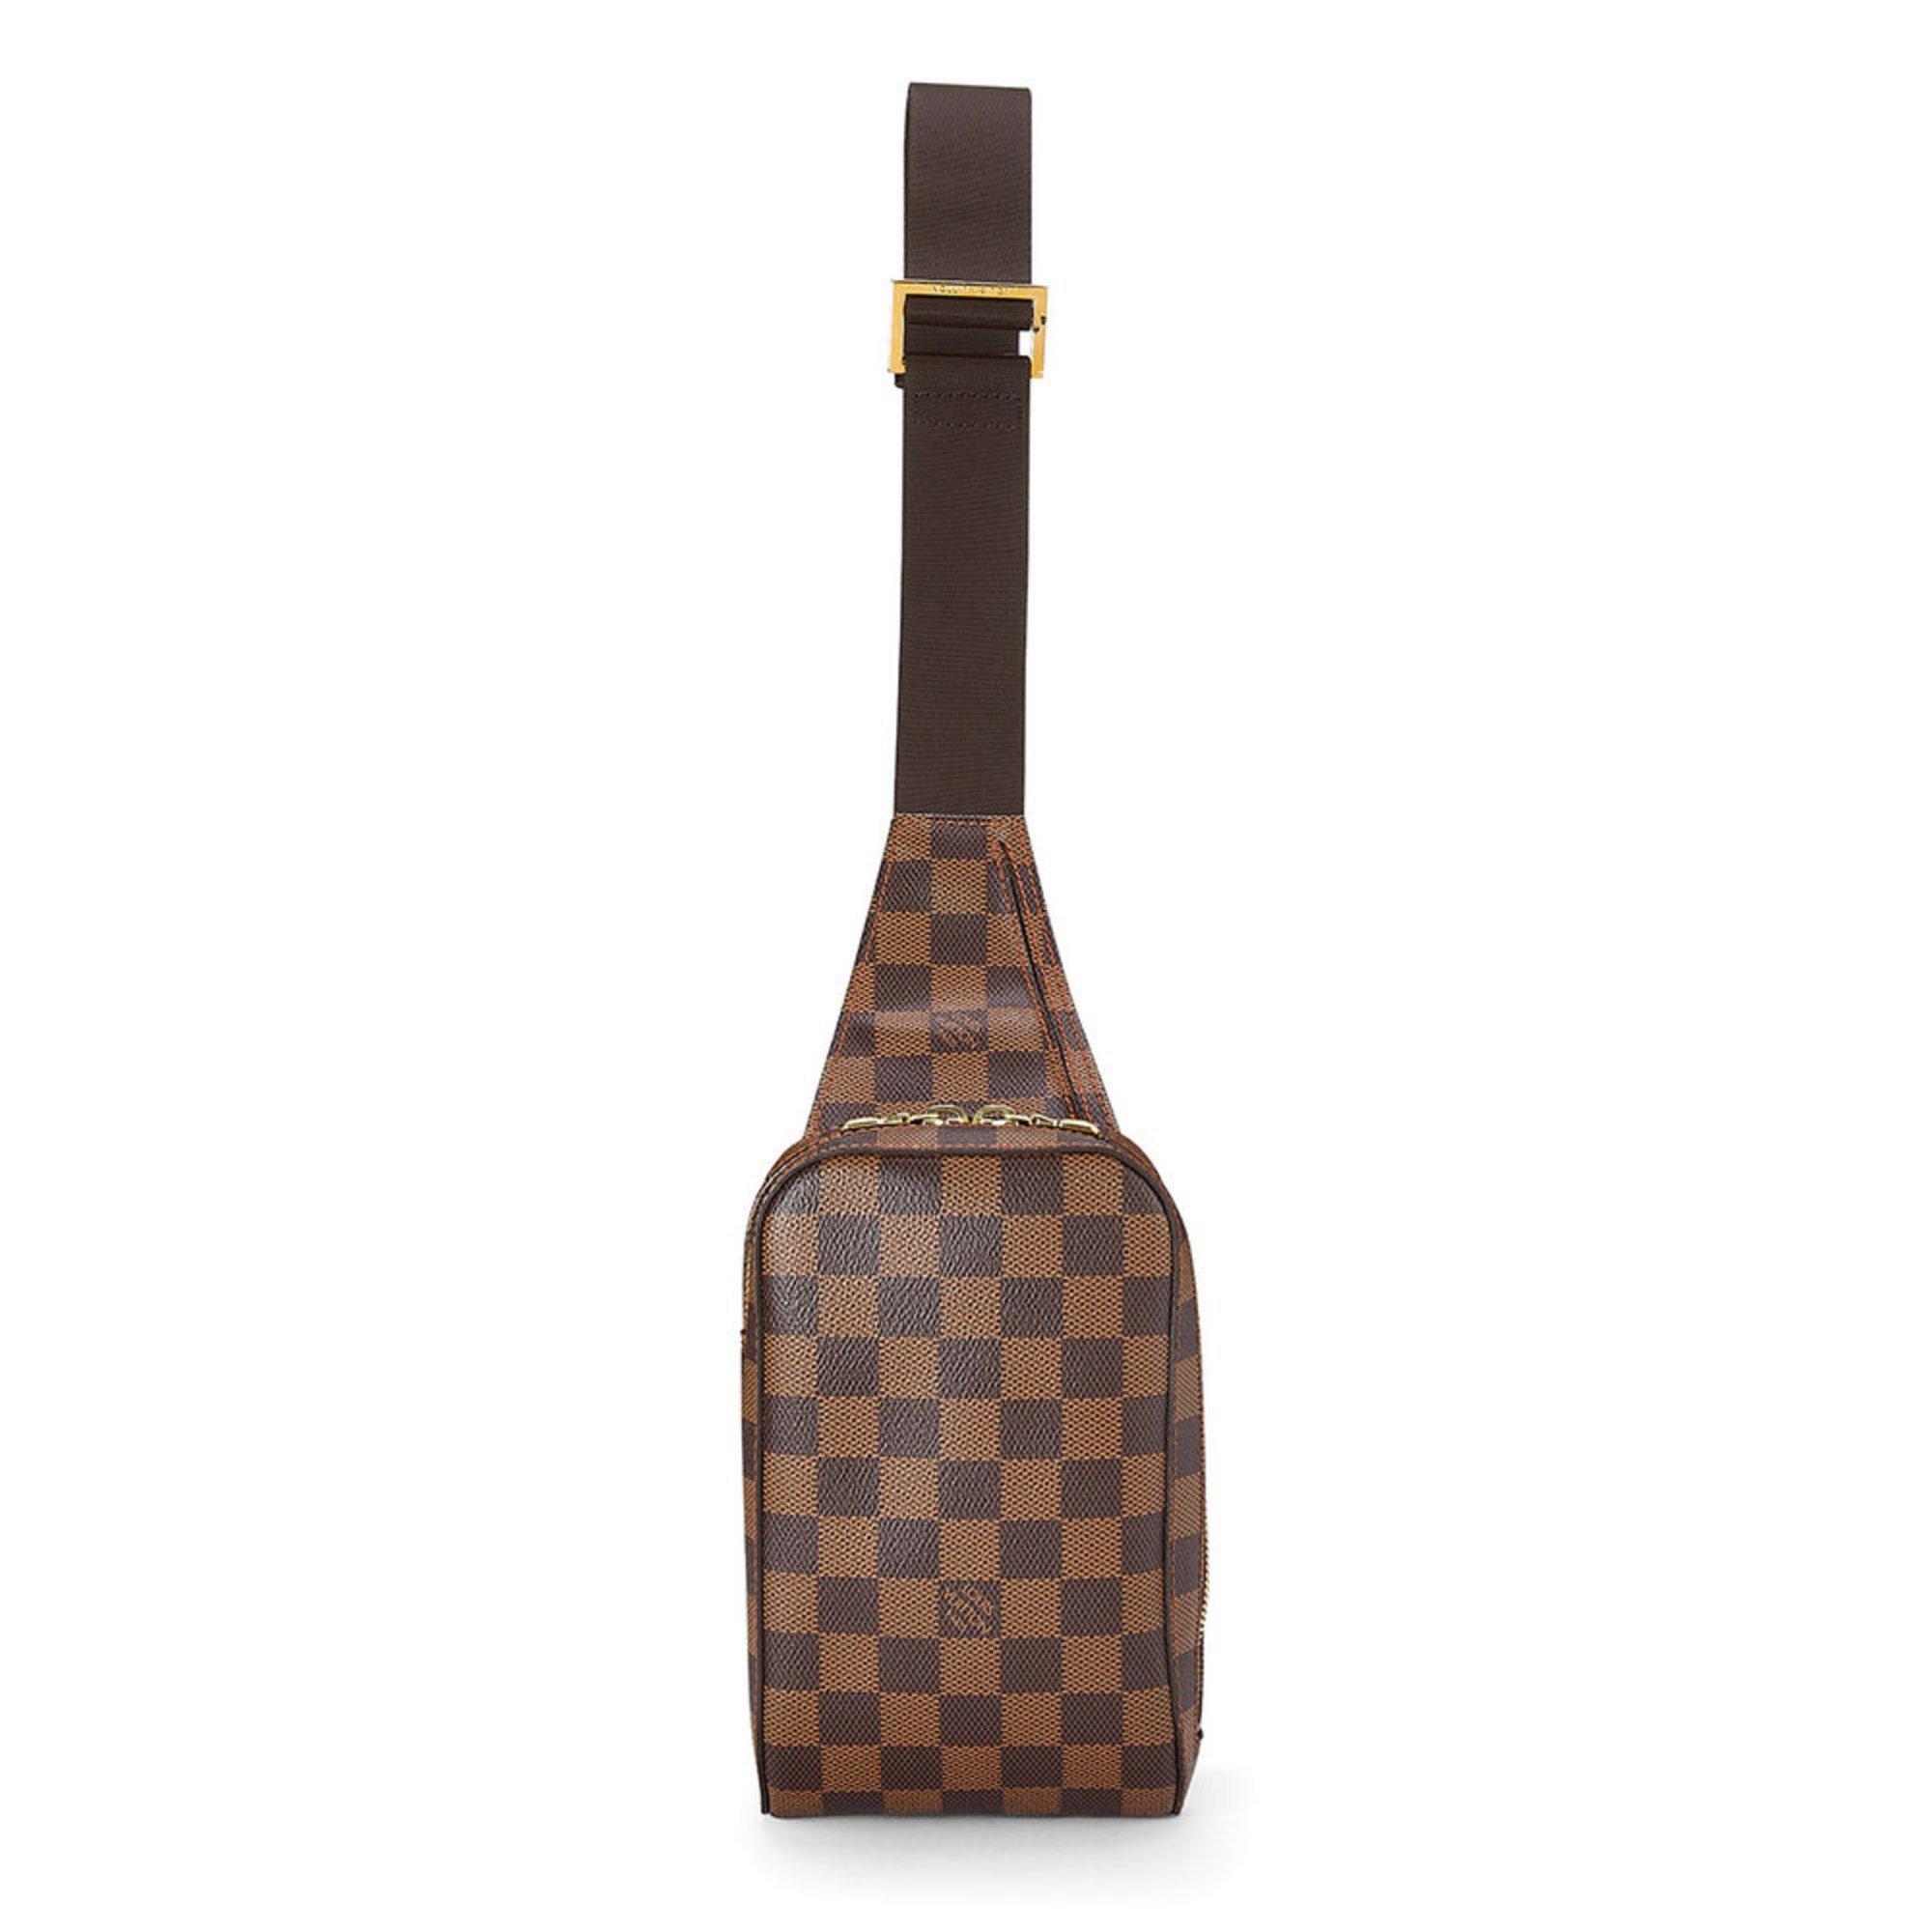 d2d7db8903 Louis Vuitton Damier Ebene Geronimos | Women's Backpacks | Handbags ...